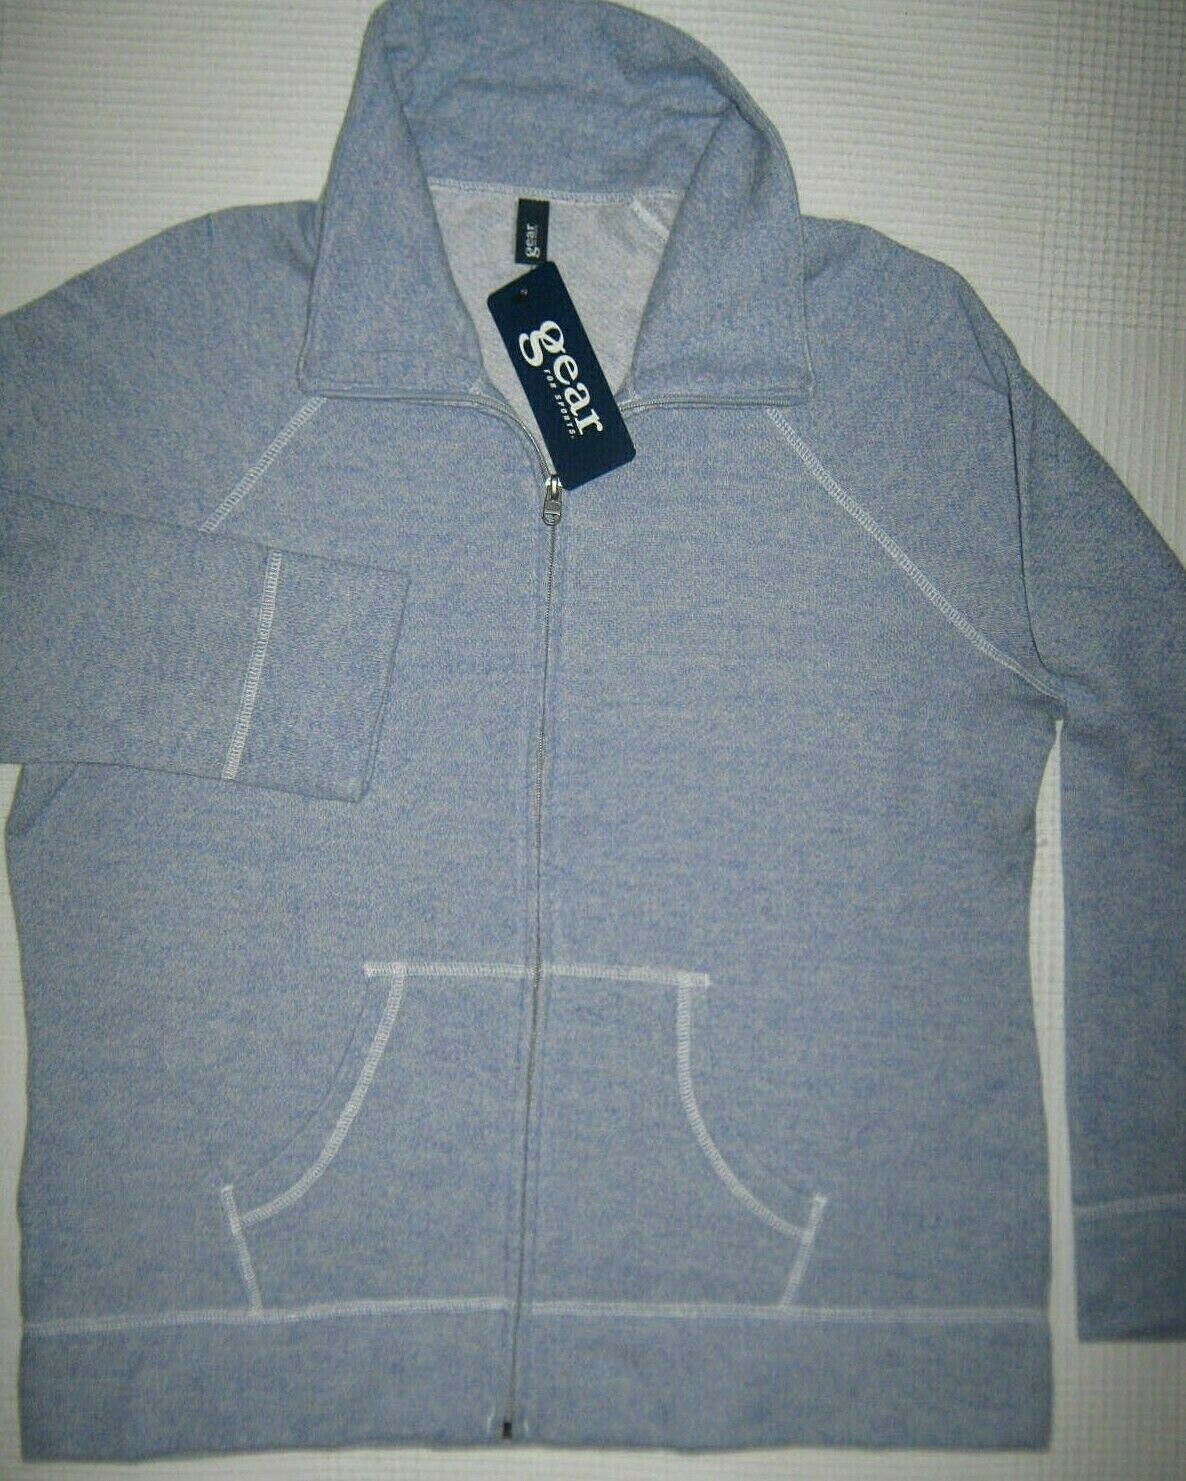 GEAR Sports Womens Track Sweatshirt Blue NWT Kangaroo Pockets Raglan Sleeves XL